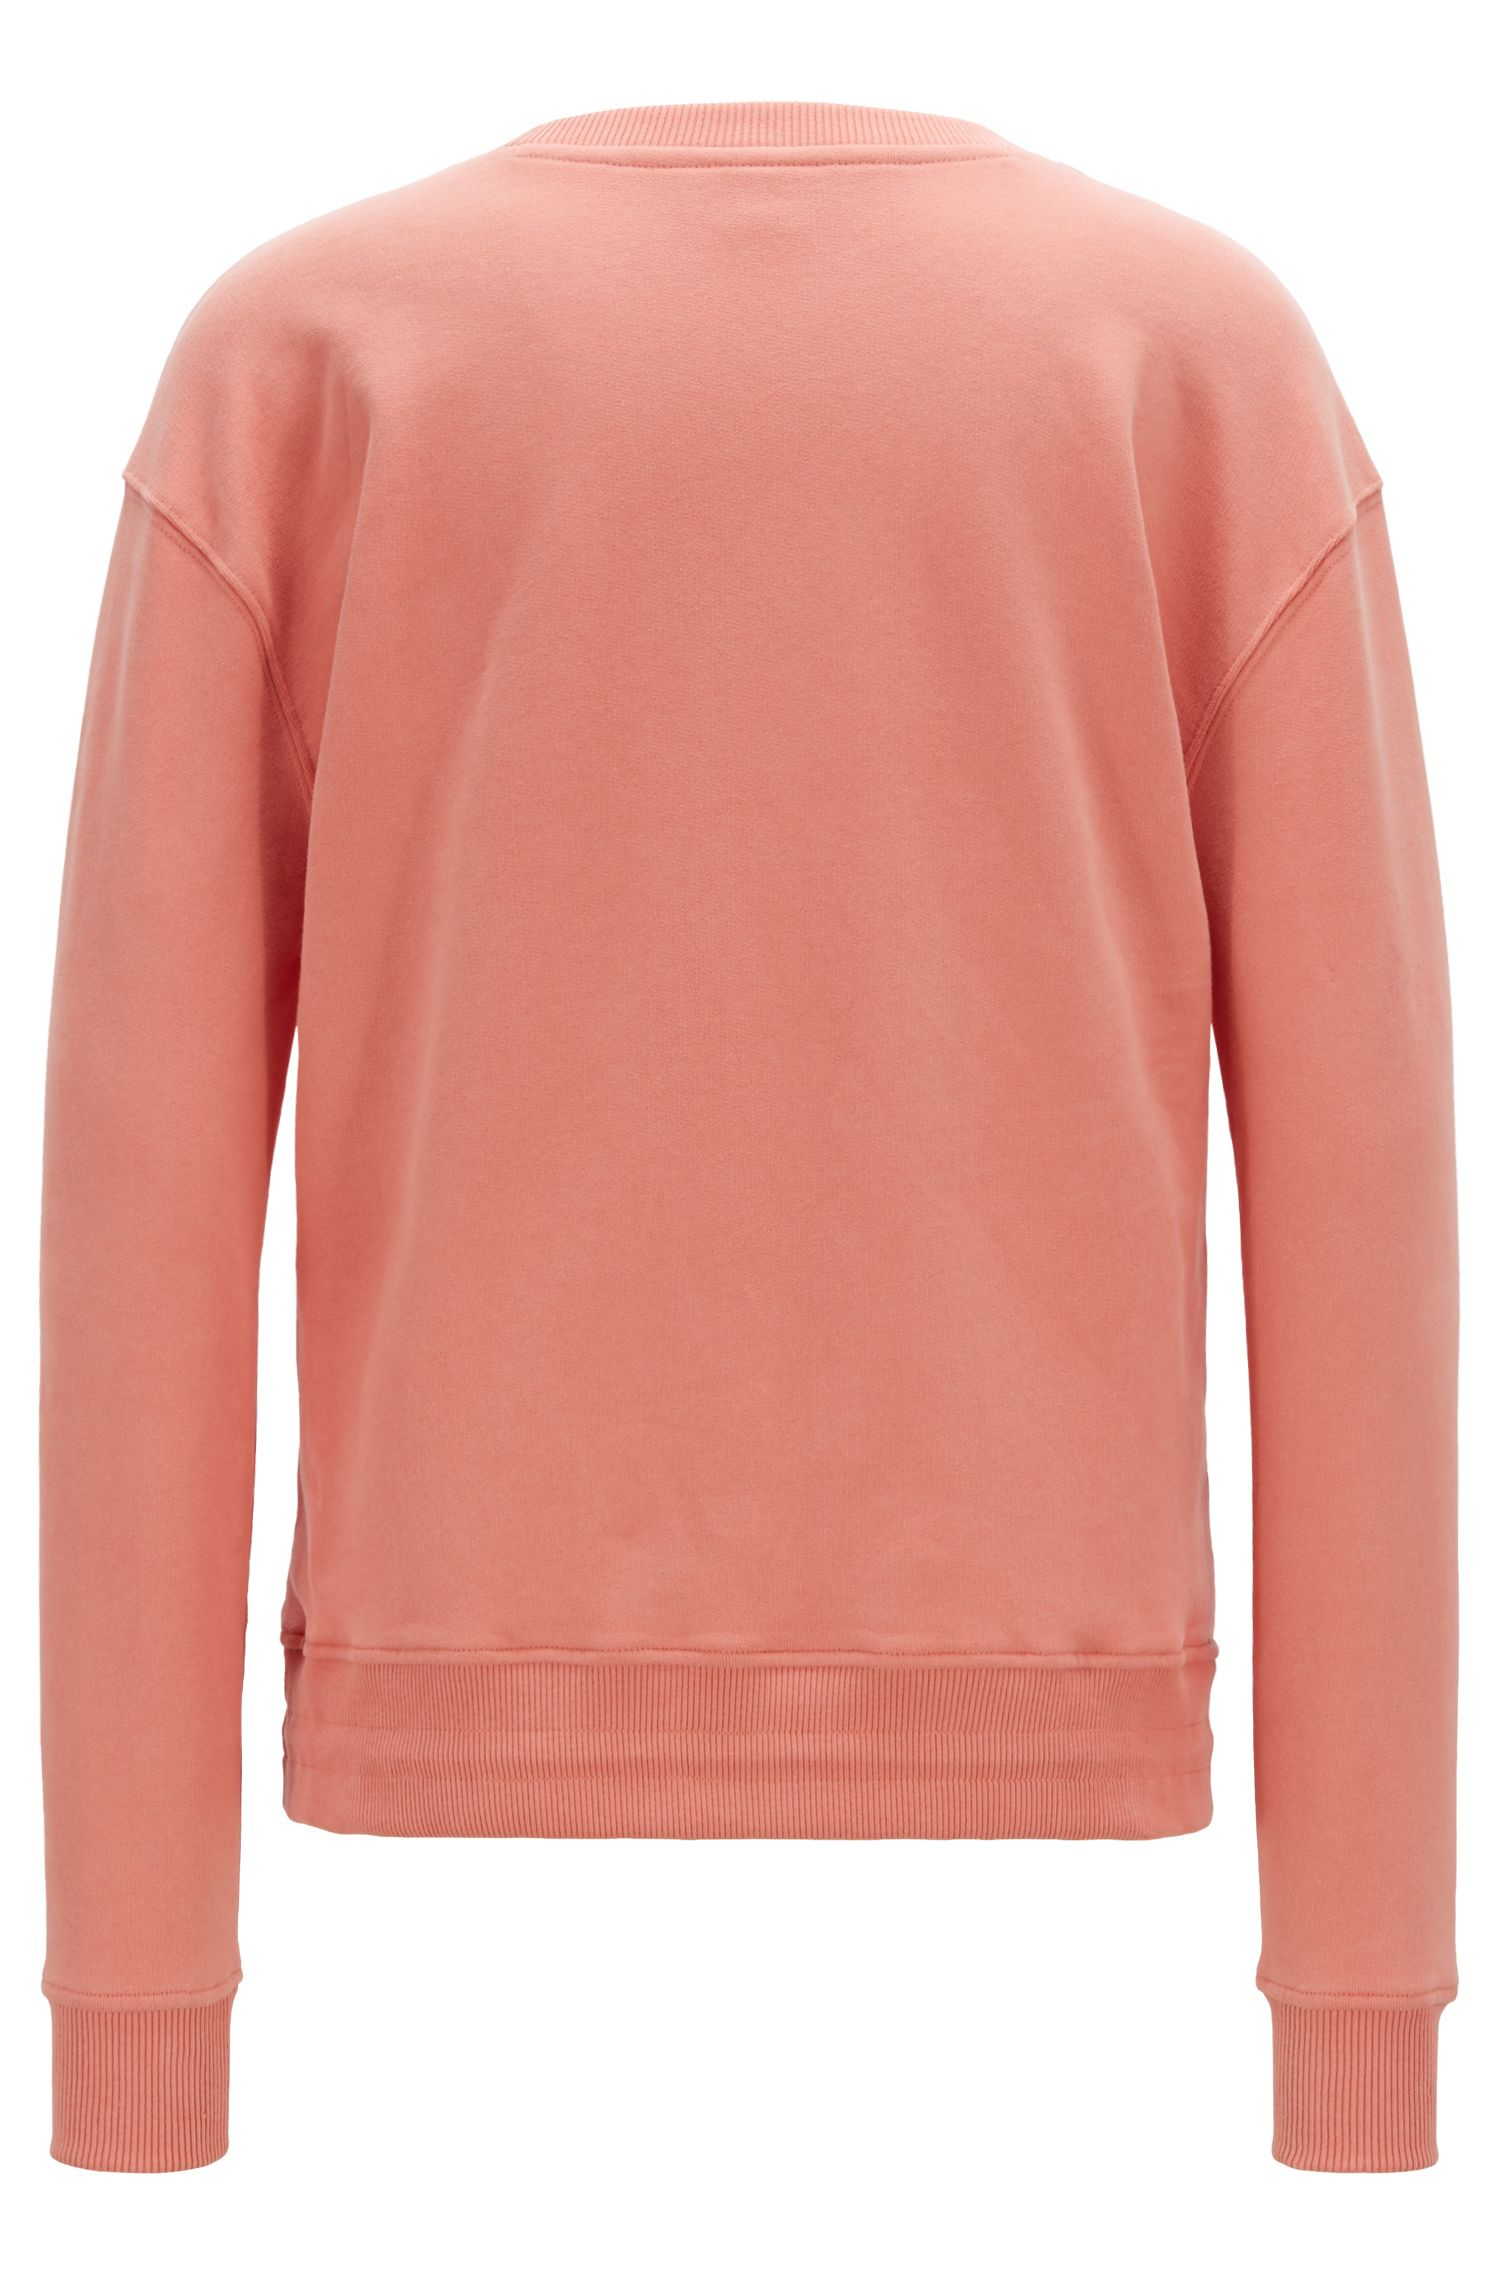 Logo sweatshirt in French terry with drawstring hem, Light Orange